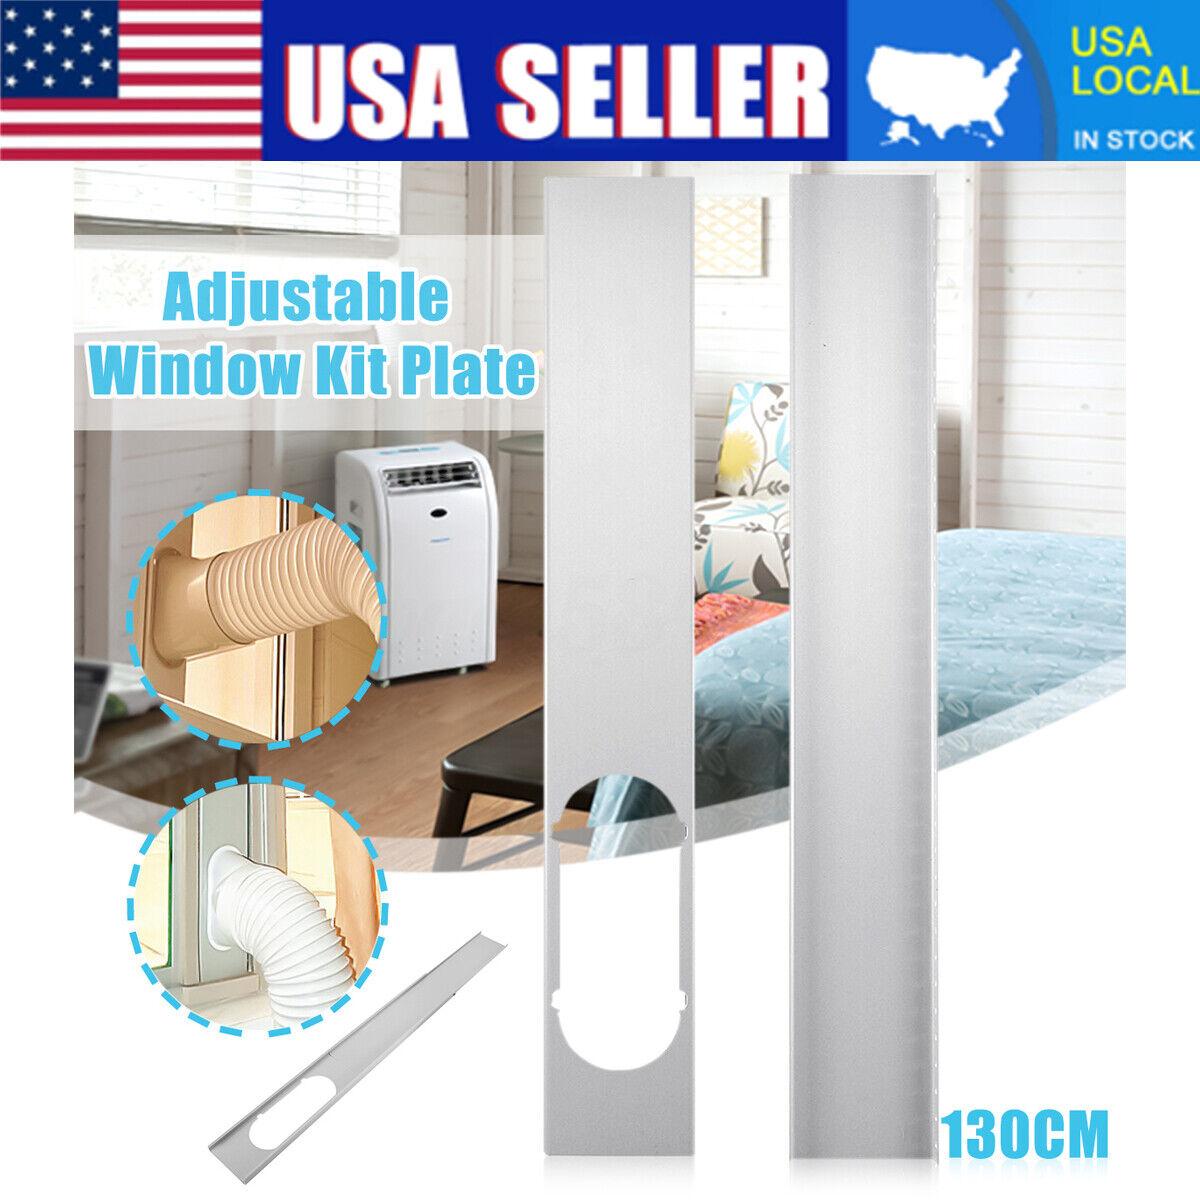 2PCS Adjustable Window Slide Kit Plate Accessories For Porta